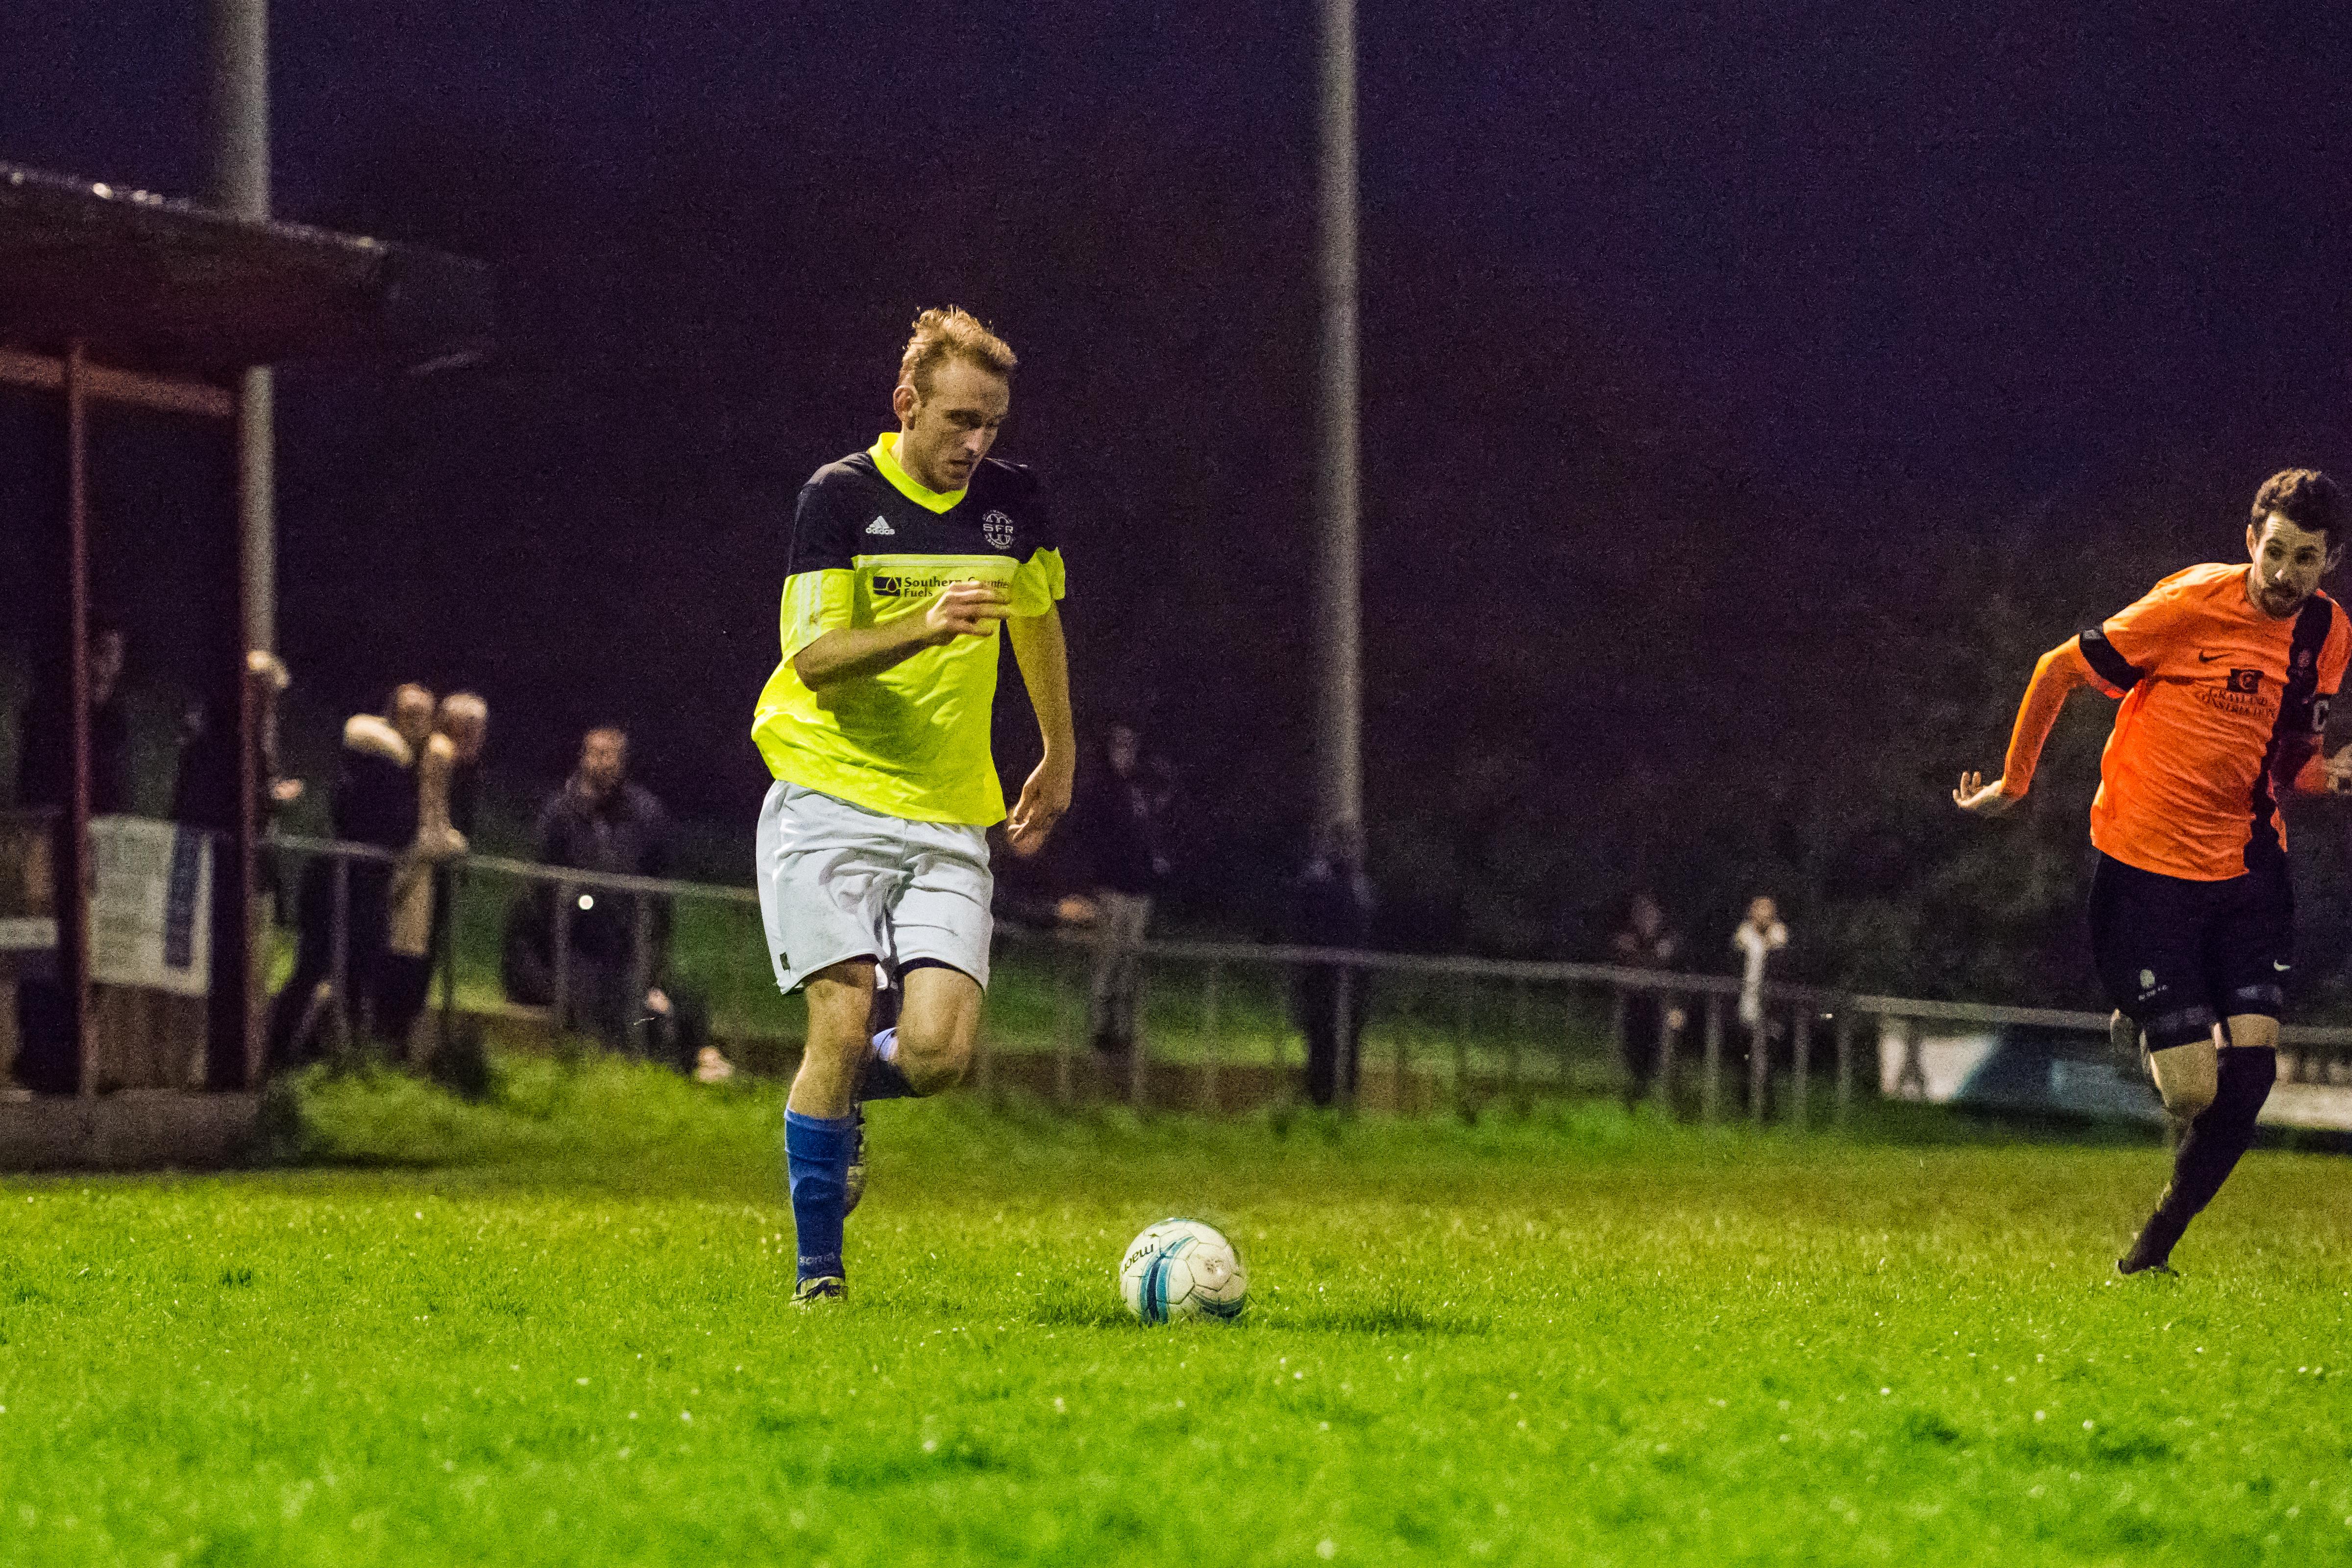 DAVID_JEFFERY Mile Oak FC vs St Francis Rangers 11.04.18 57